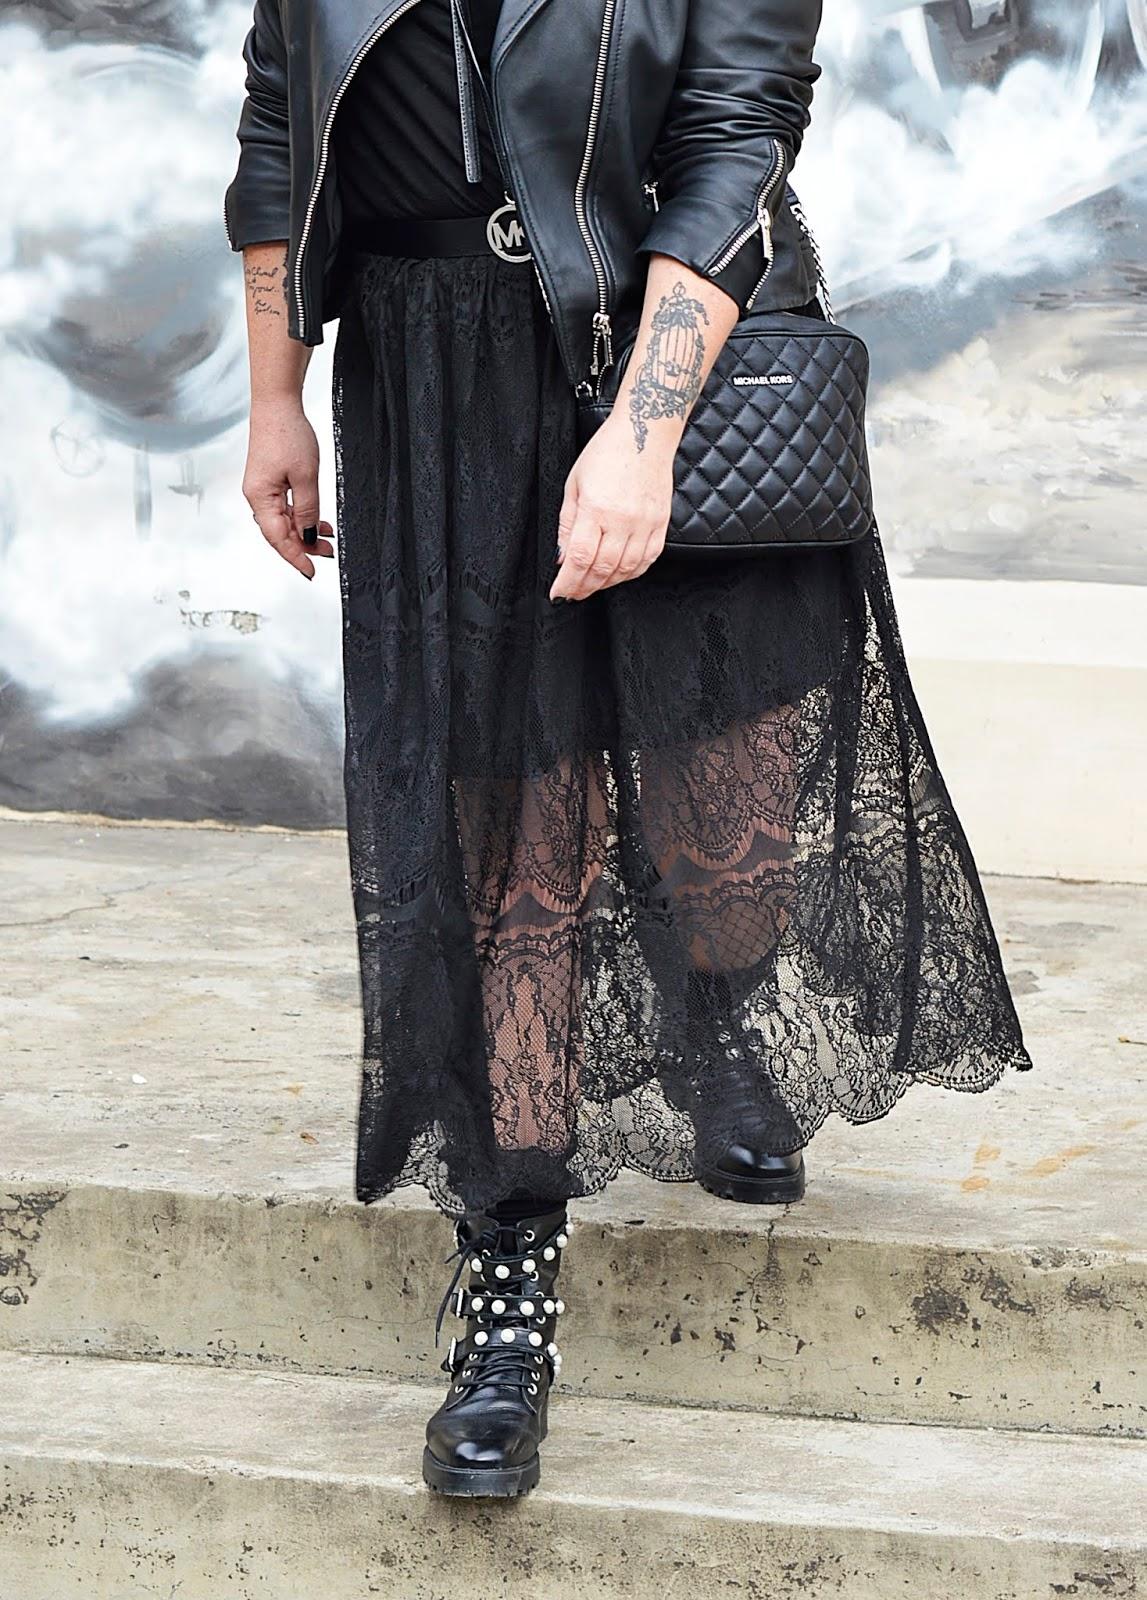 Black rock style, black fashio, black lover